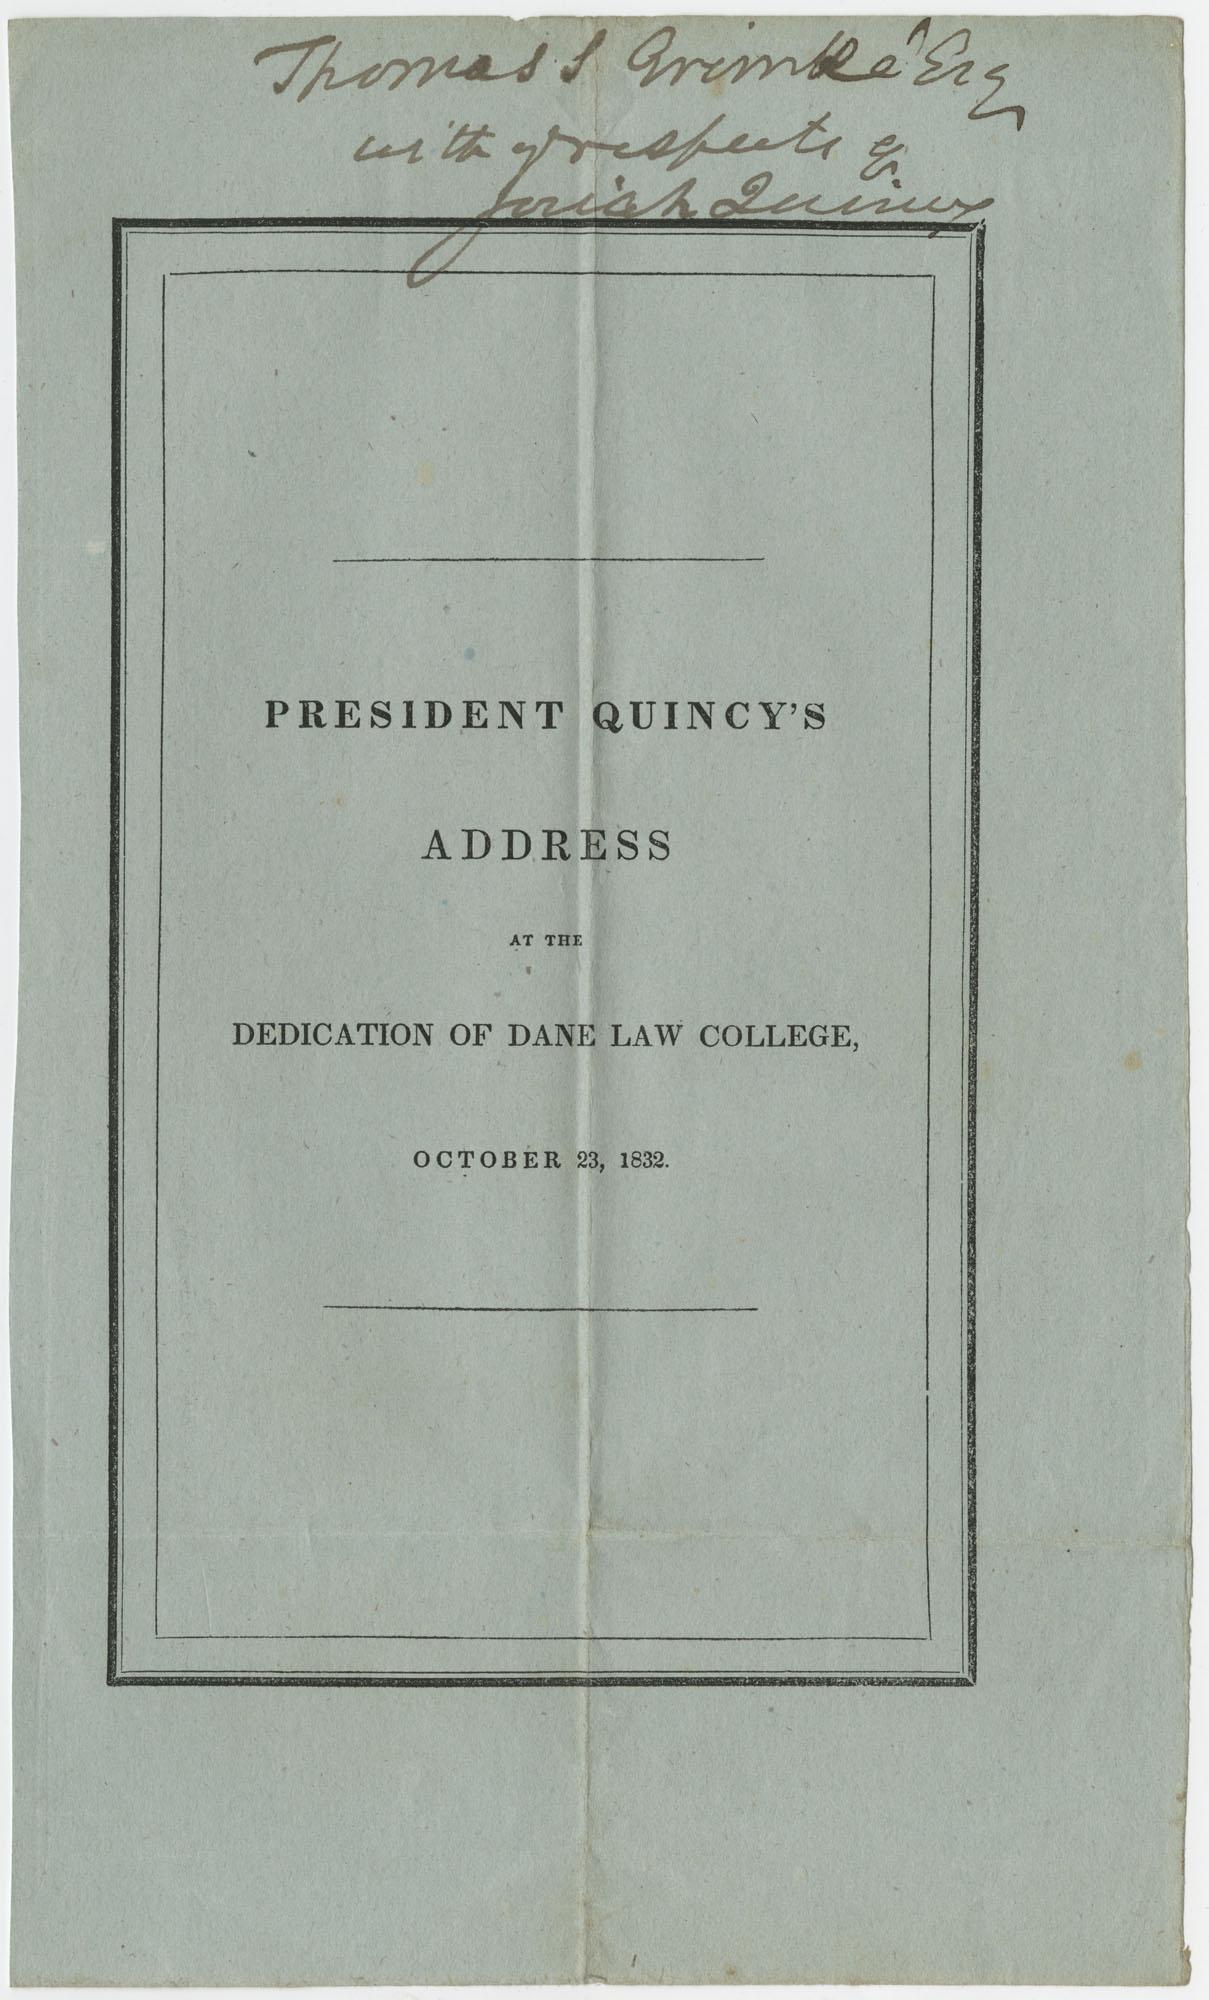 Thomas S. Grimke Autograph Collection, autograph of Harvard University president, Josiah Quincy III, October 23, 1832